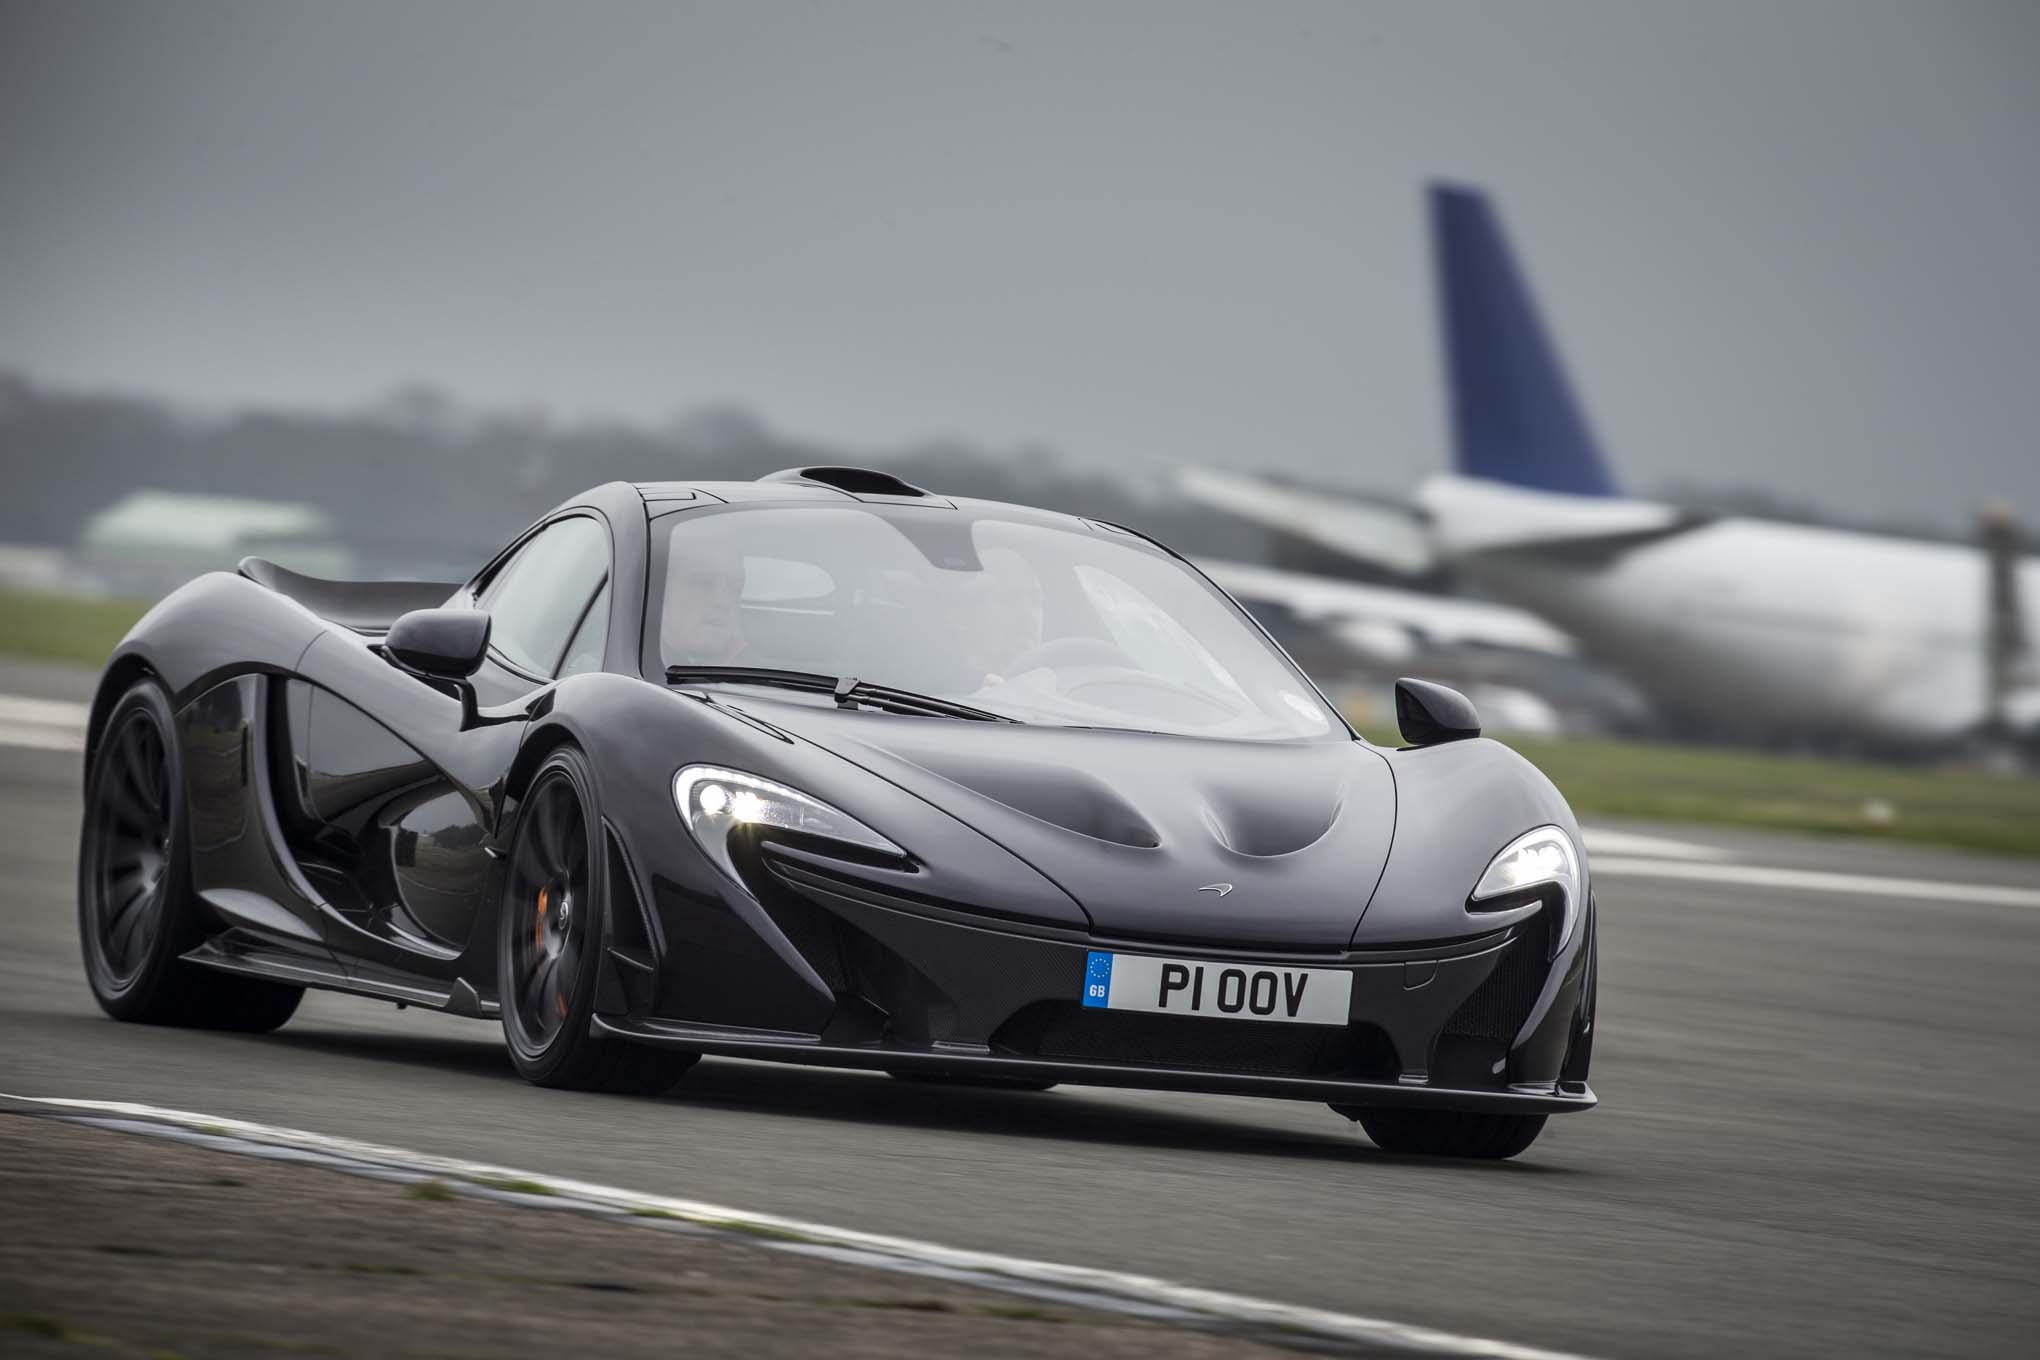 http://st.automobilemag.com/uploads/sites/11/2014/03/2014-Mclaren-P1-black-front-end-in-motion-02.jpg